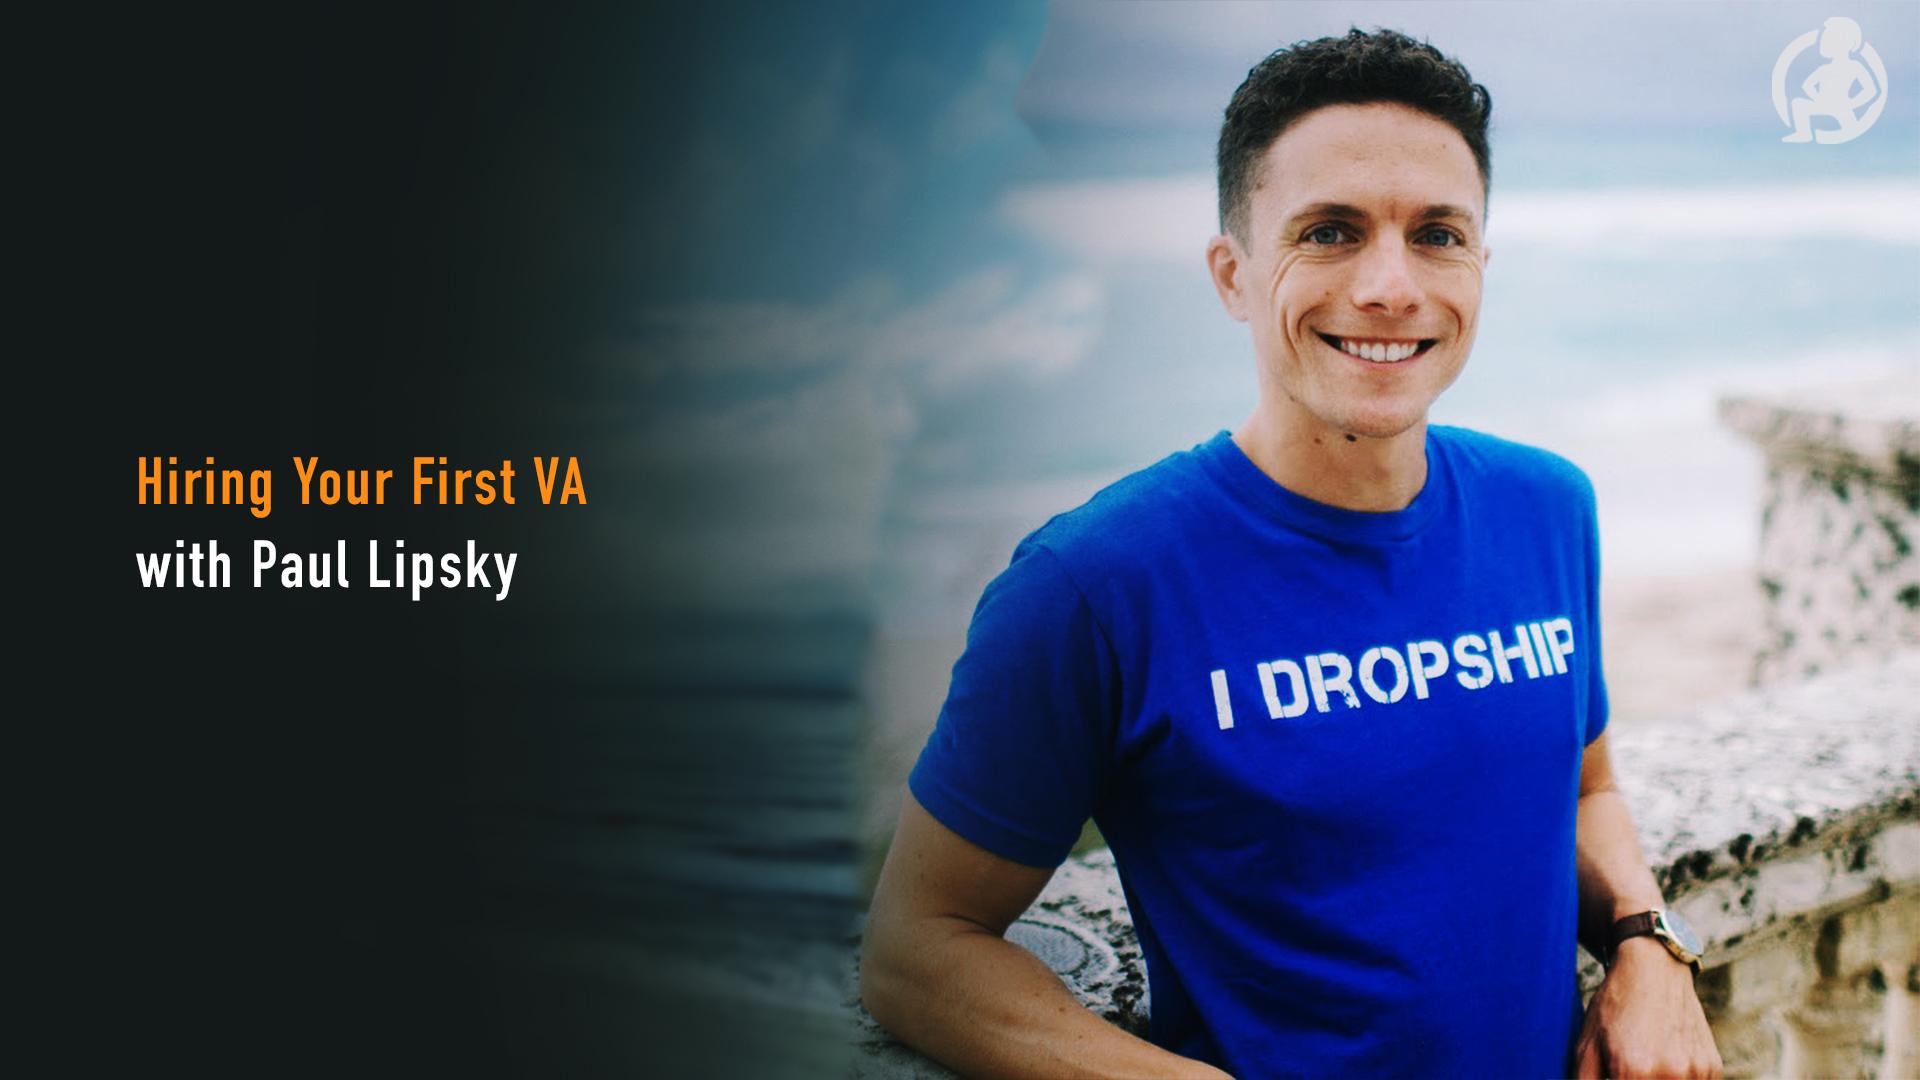 Paul Lipsky Hiring First VA Feature